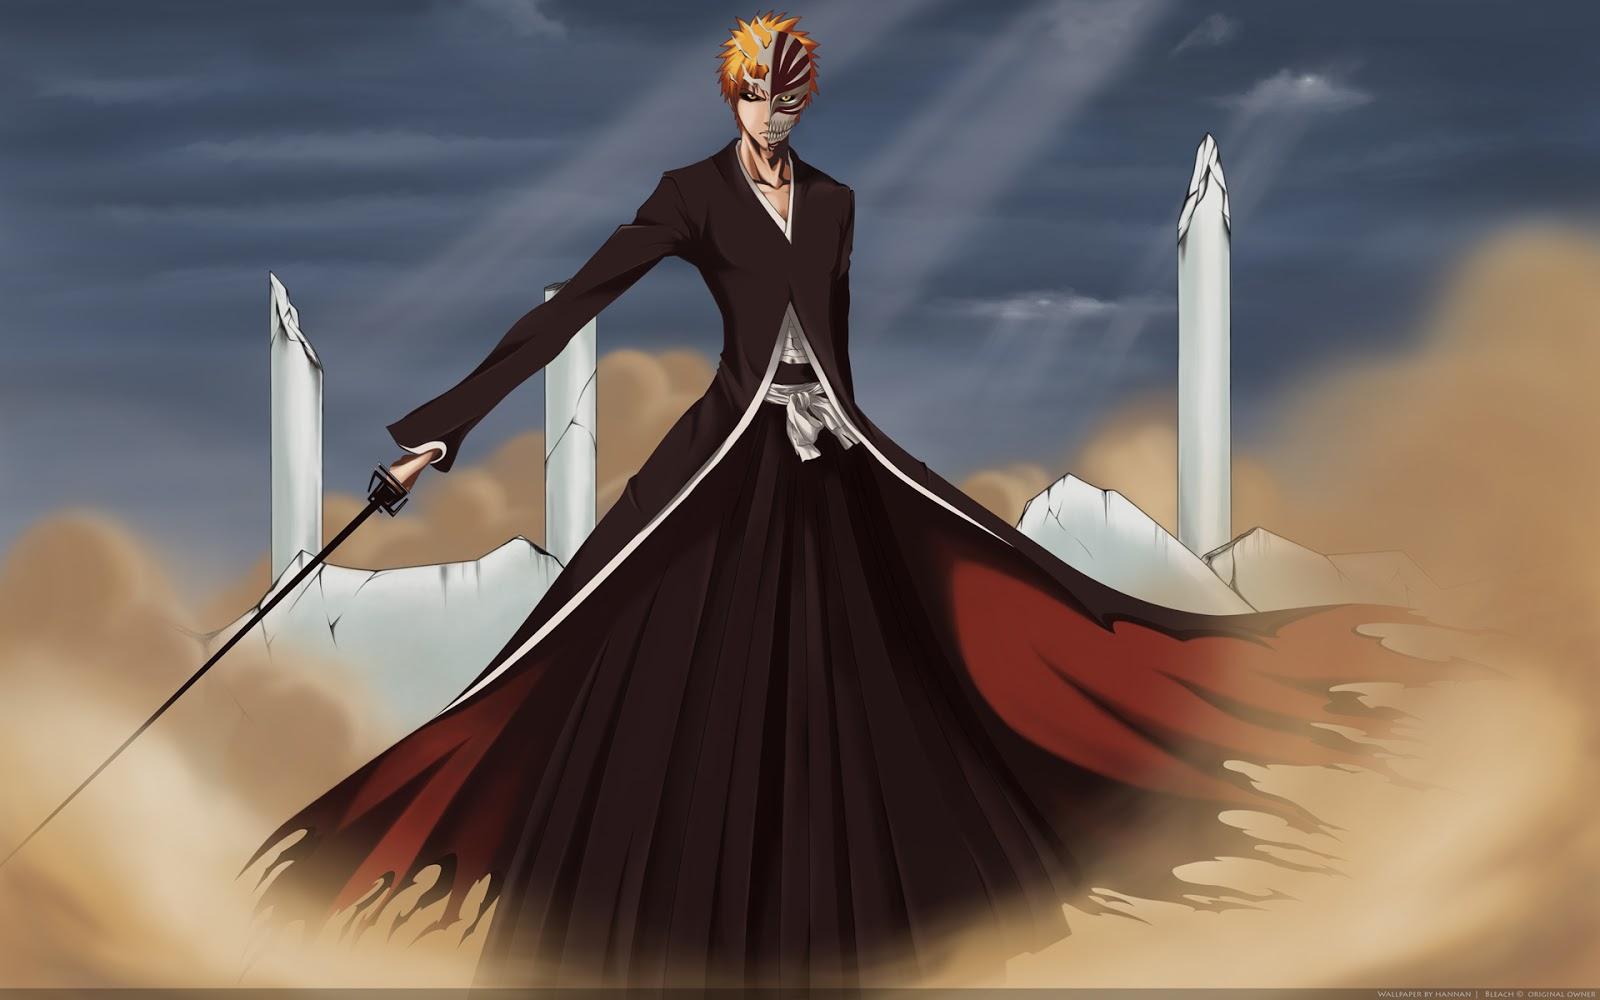 Kurosaki Ichigo 17 Wallpapers | Your daily Anime Wallpaper ...